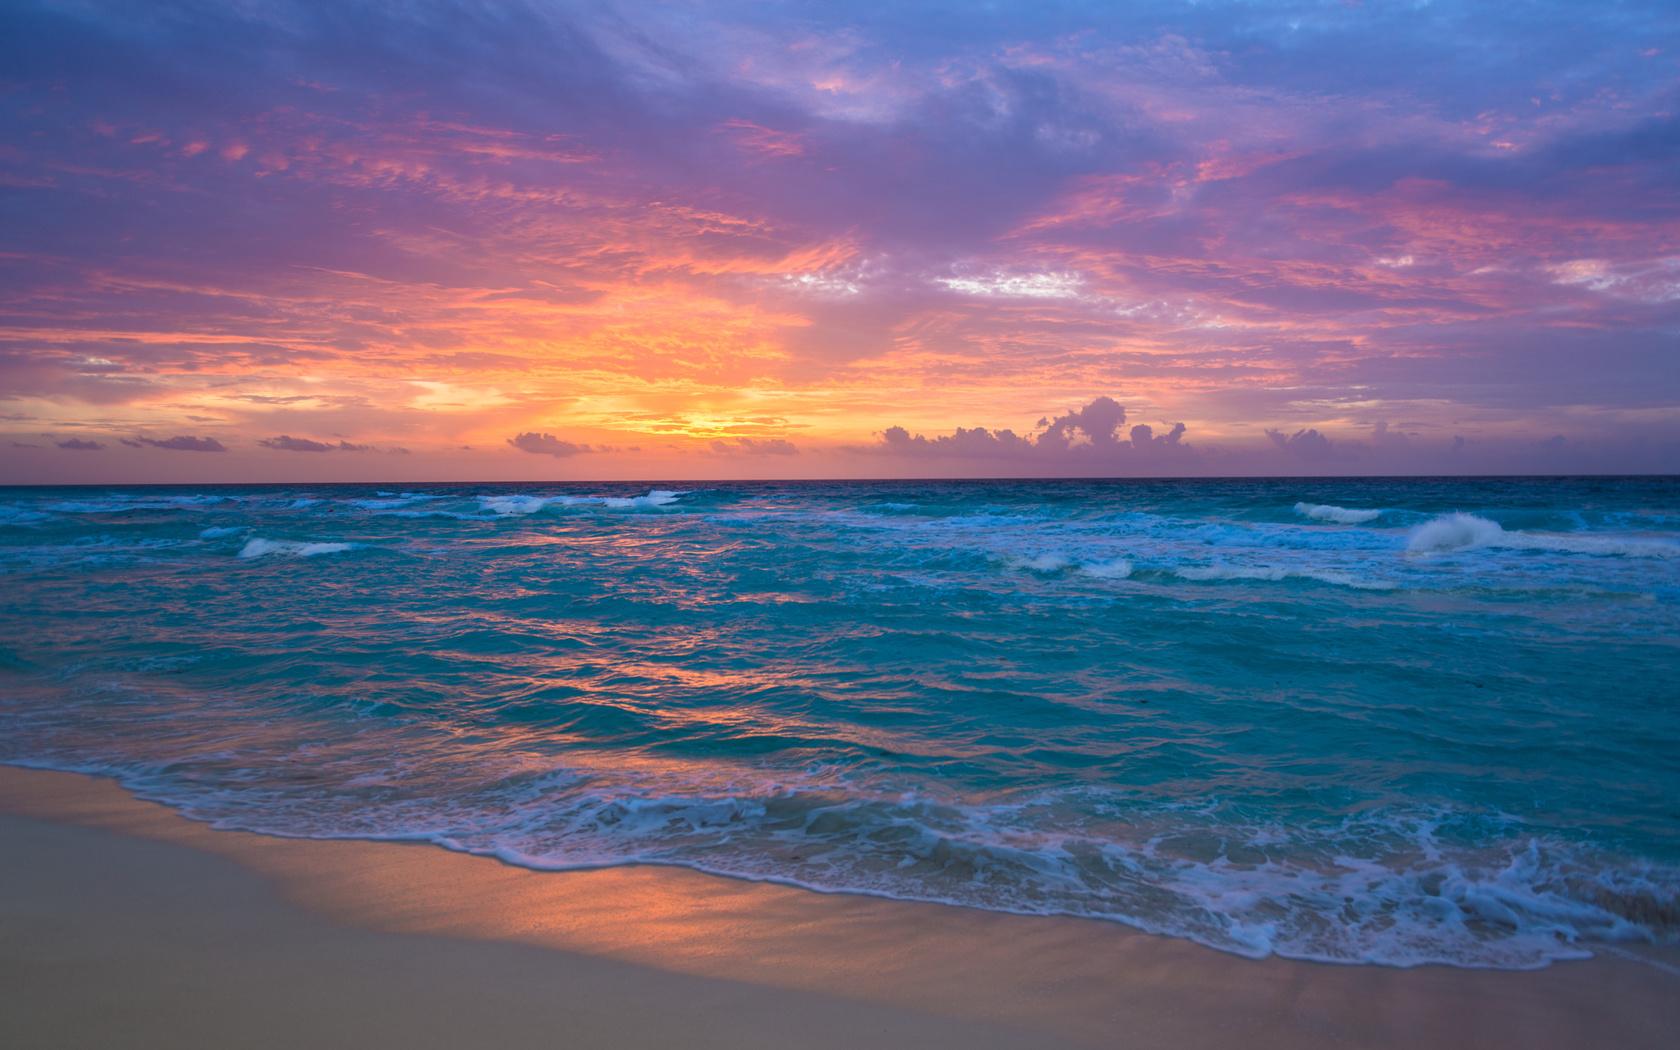 sunrise, cancun, mexico, caribbean sea